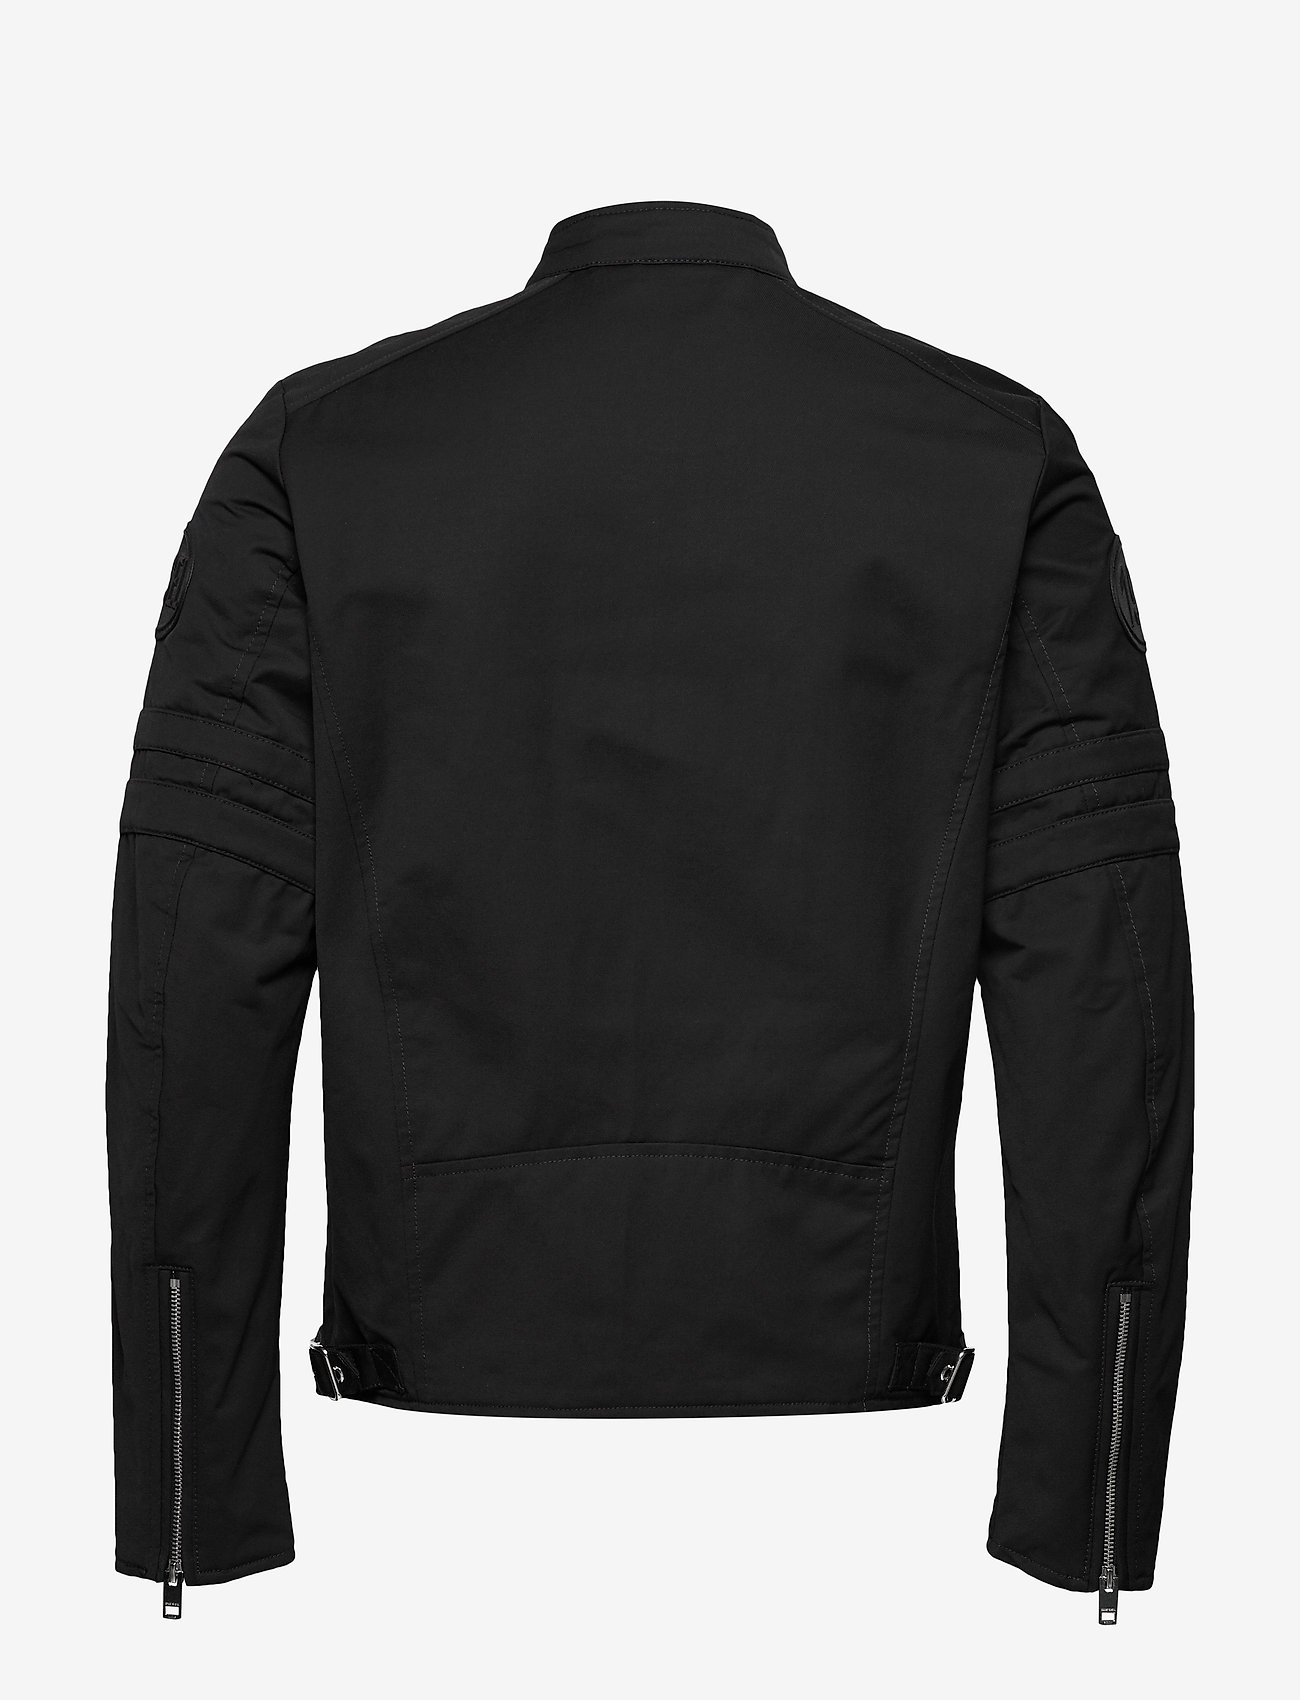 Diesel Men - J-GLORY GIACCA JACKET - light jackets - black - 1